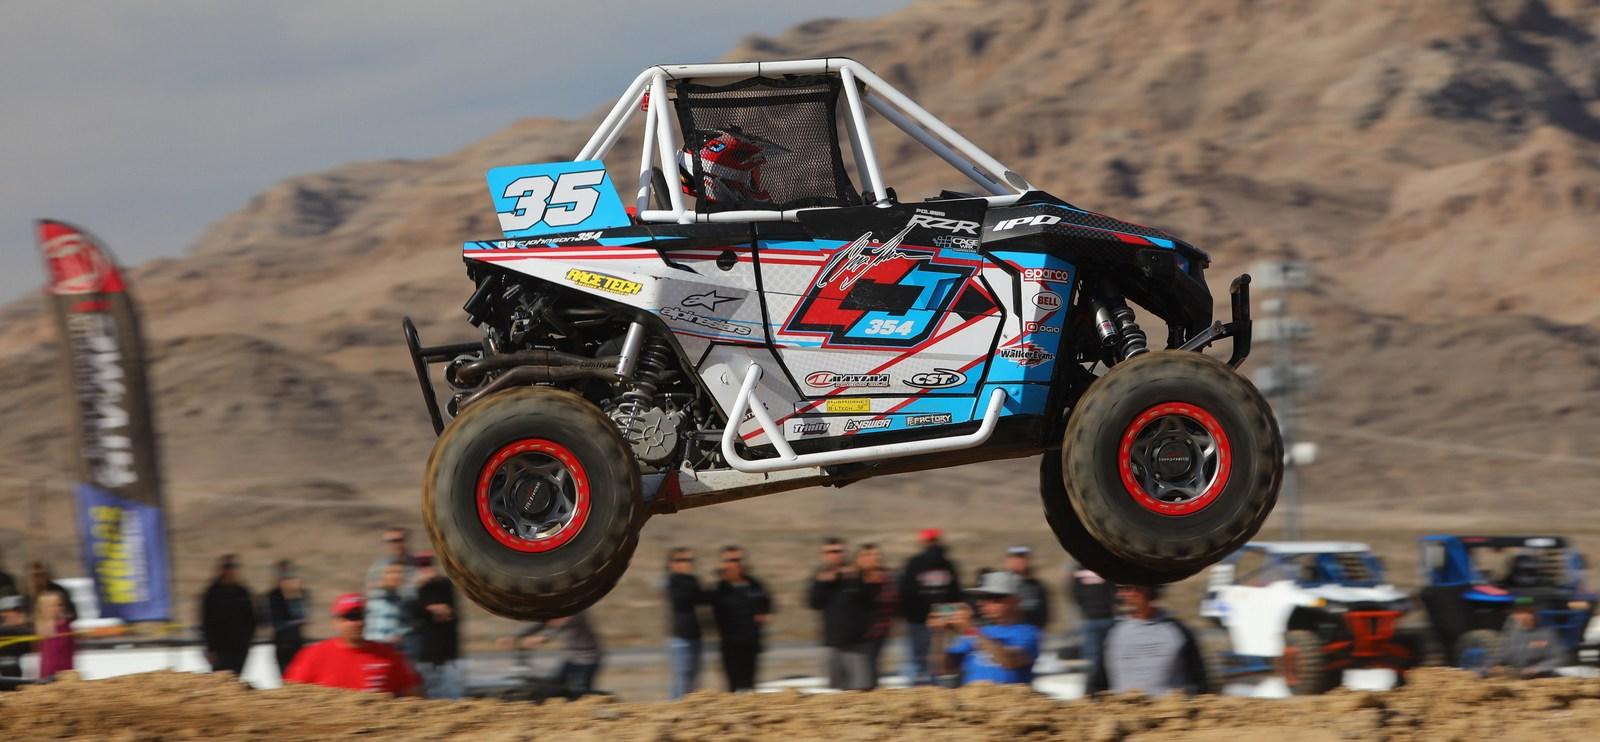 2020-01-chris-johnson-pro-stock-sxs-worcs-racing